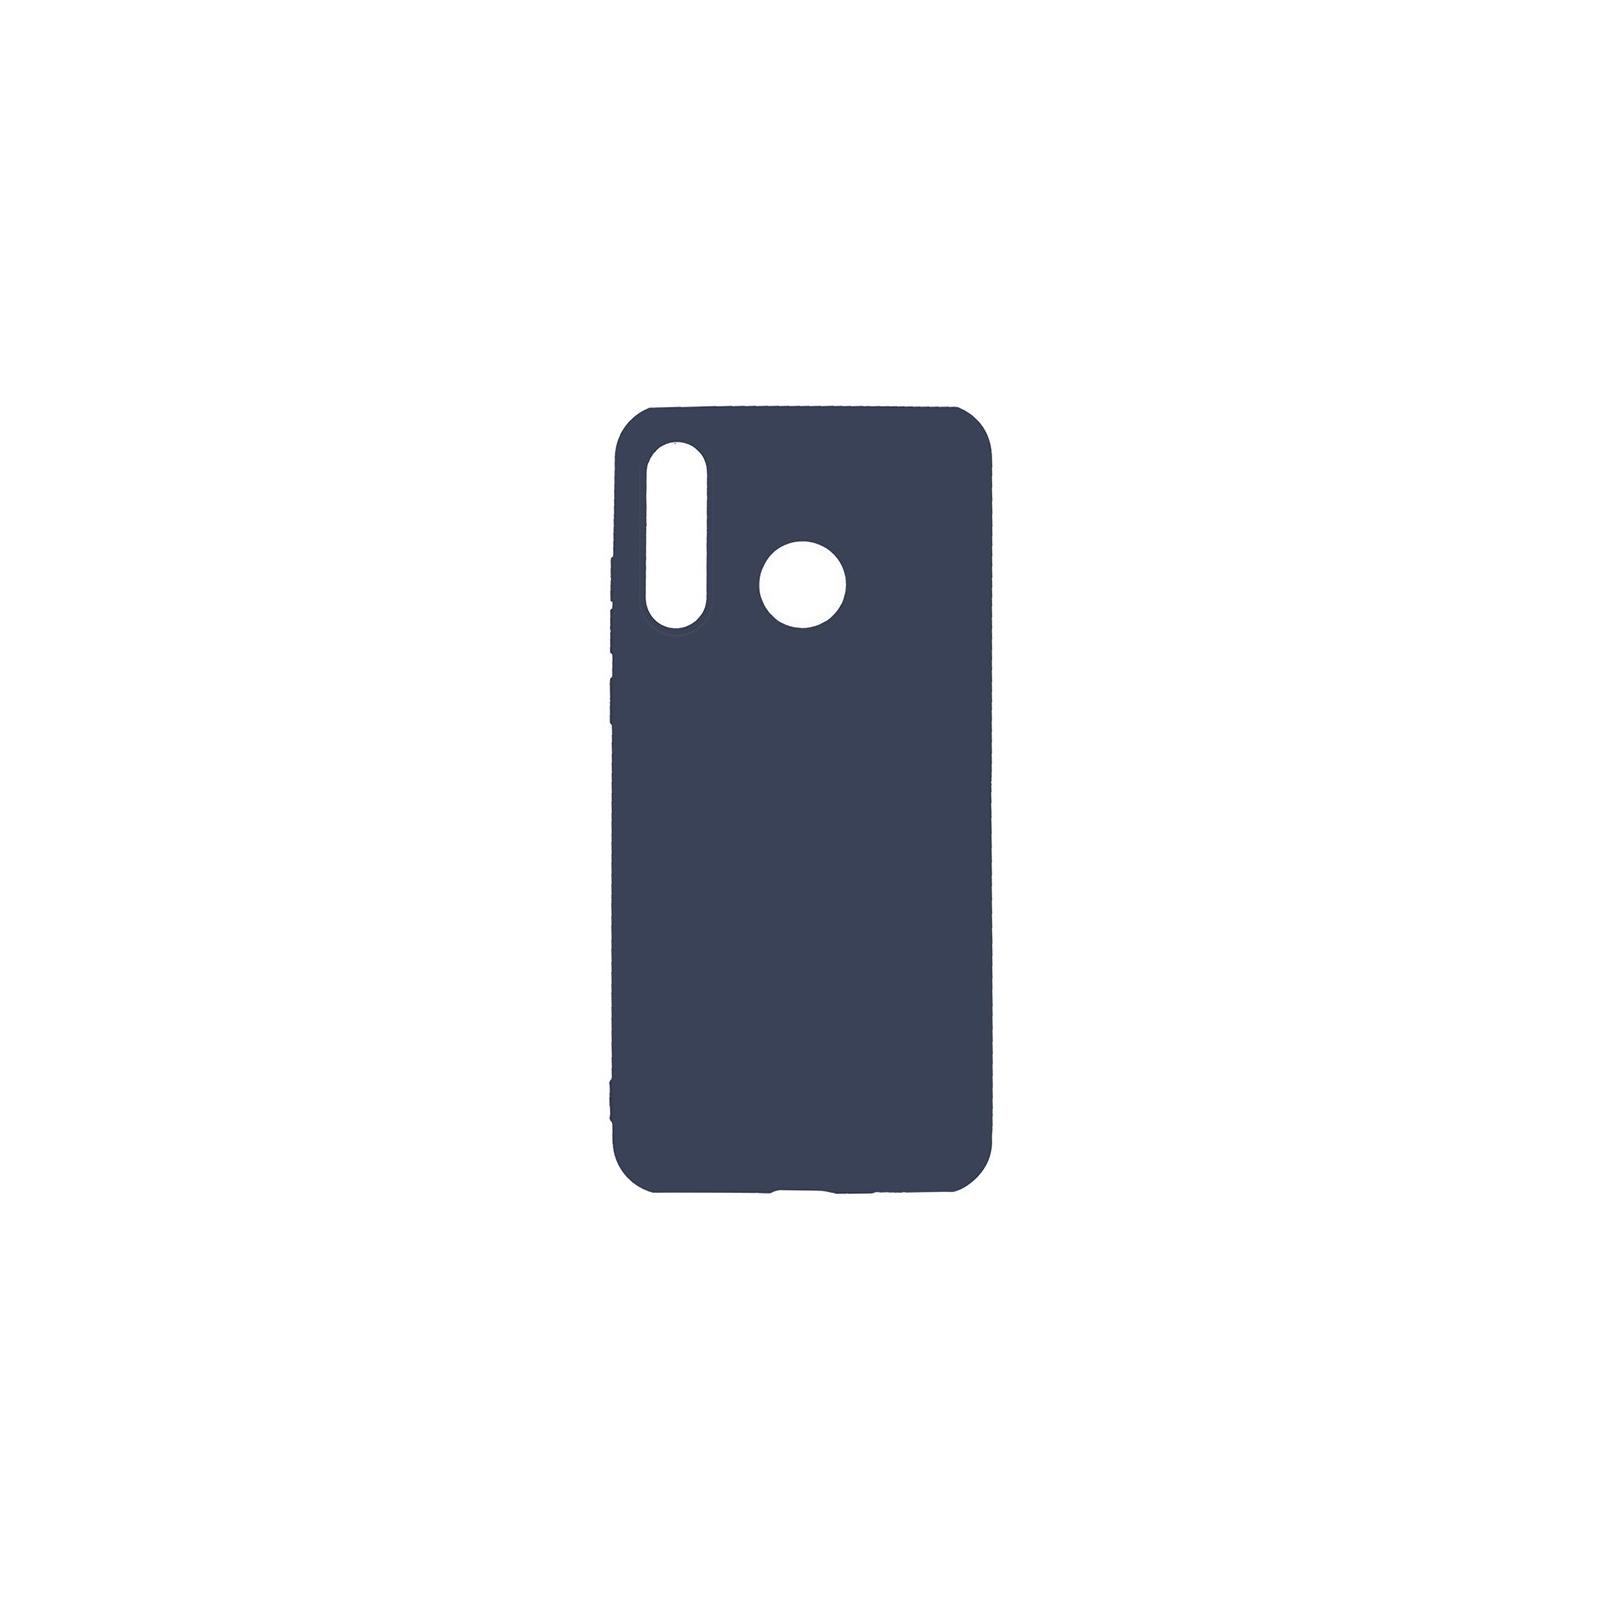 Чехол для моб. телефона Toto 1mm Matt TPU Case Huawei P30 Lite Ocean Blue (F_93987)